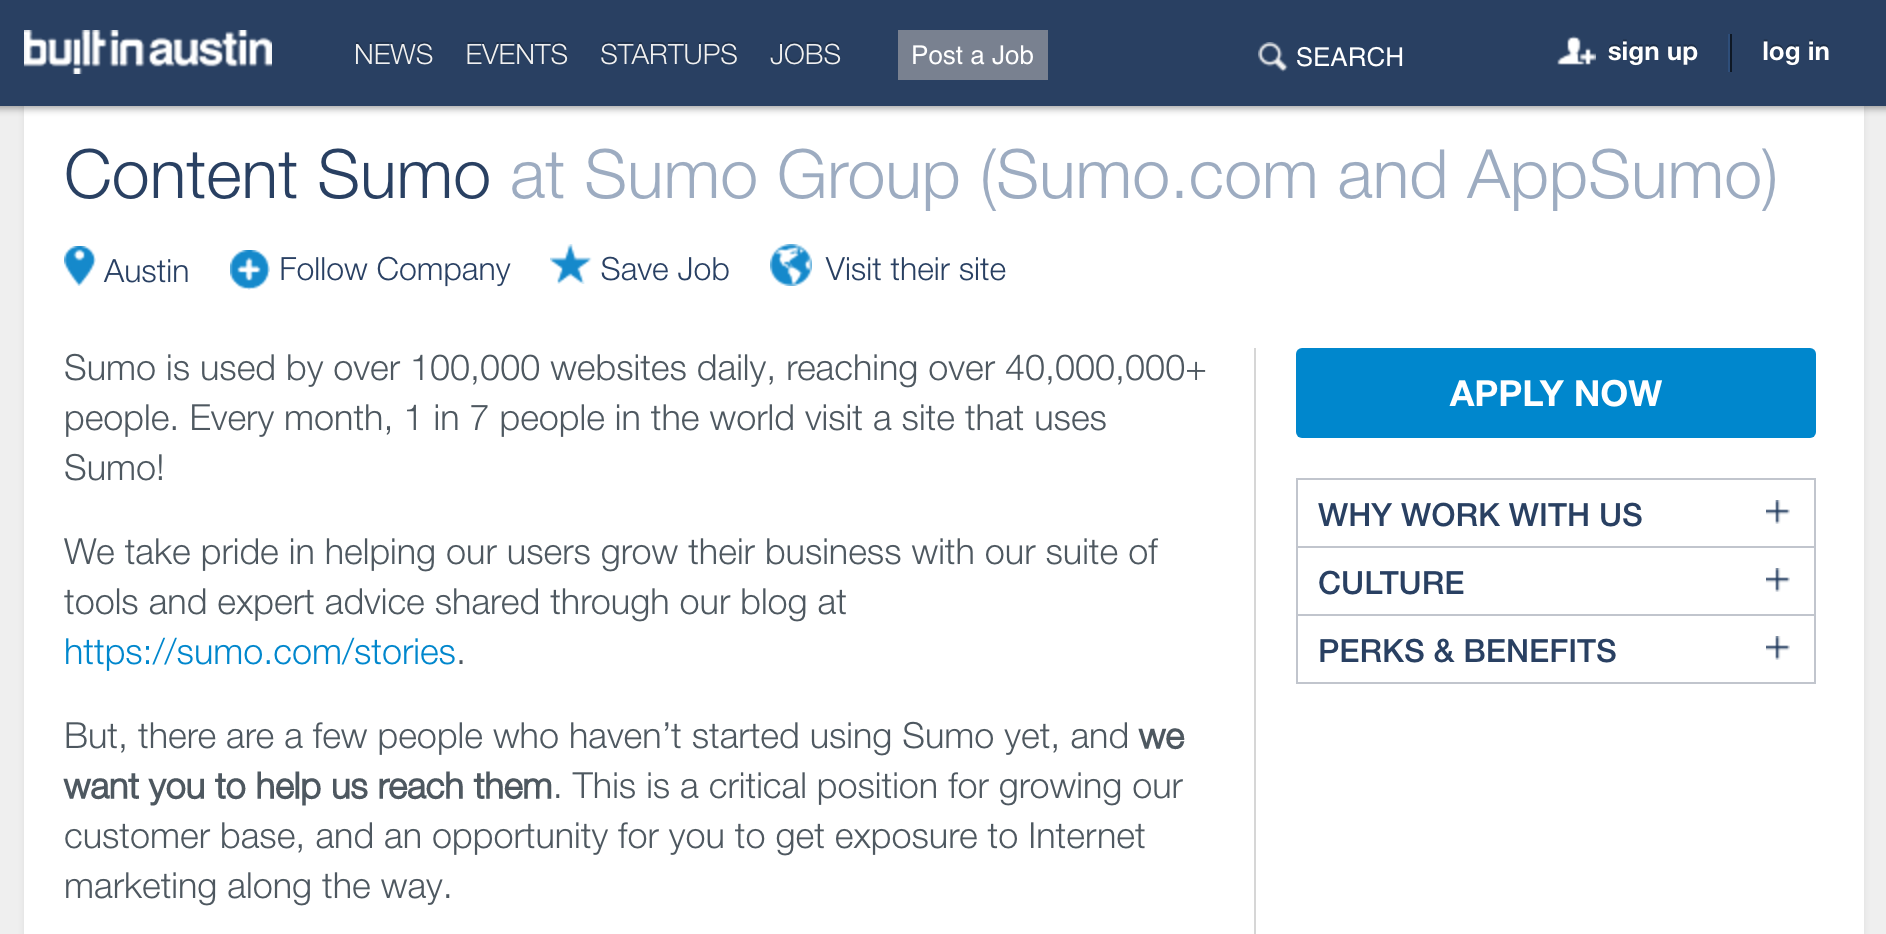 Screenshot showing a job opening on Sumo.com